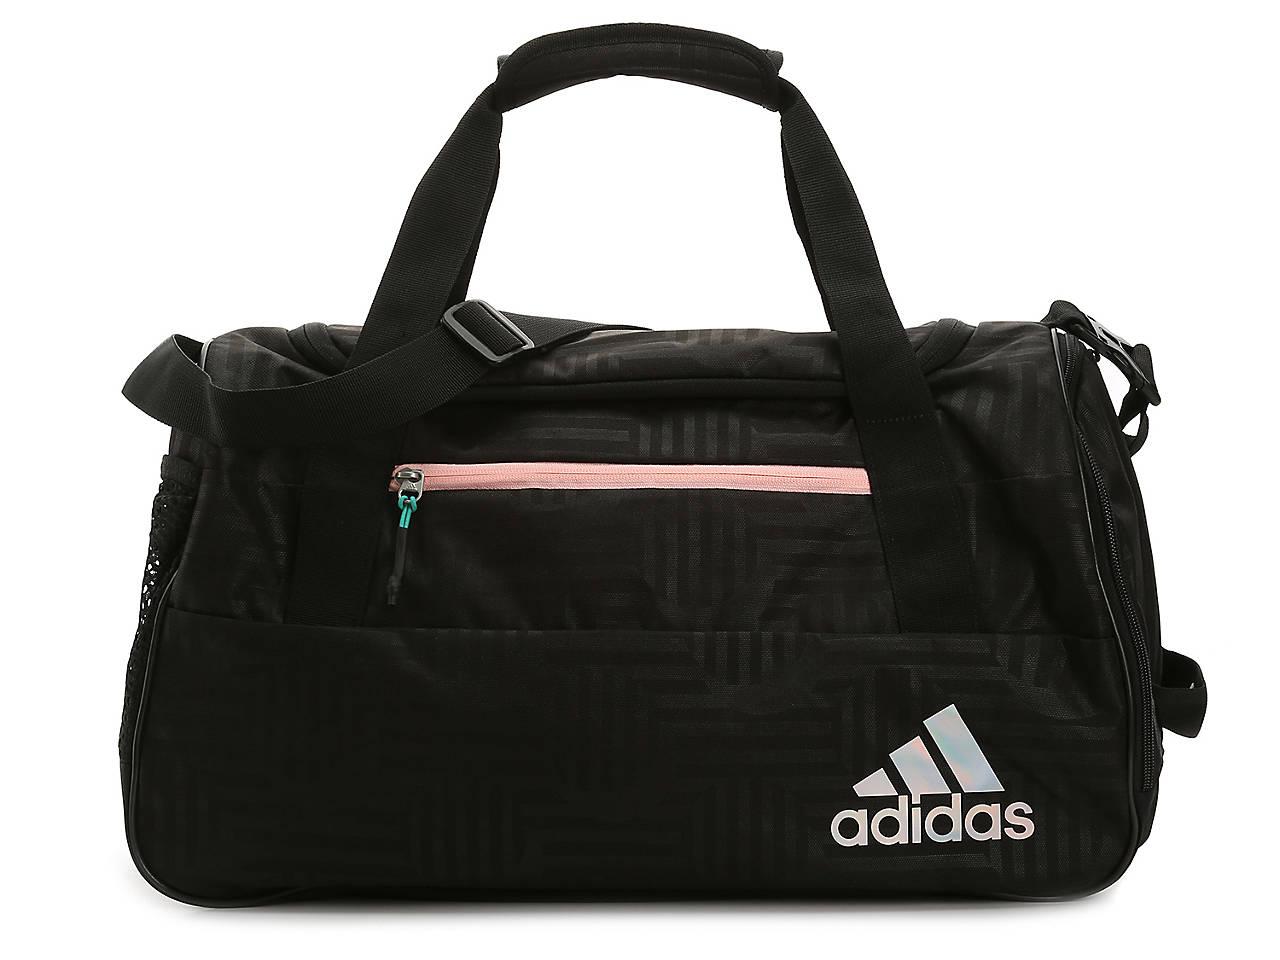 33a399103d adidas Squad III Gym Bag Women s Handbags   Accessories